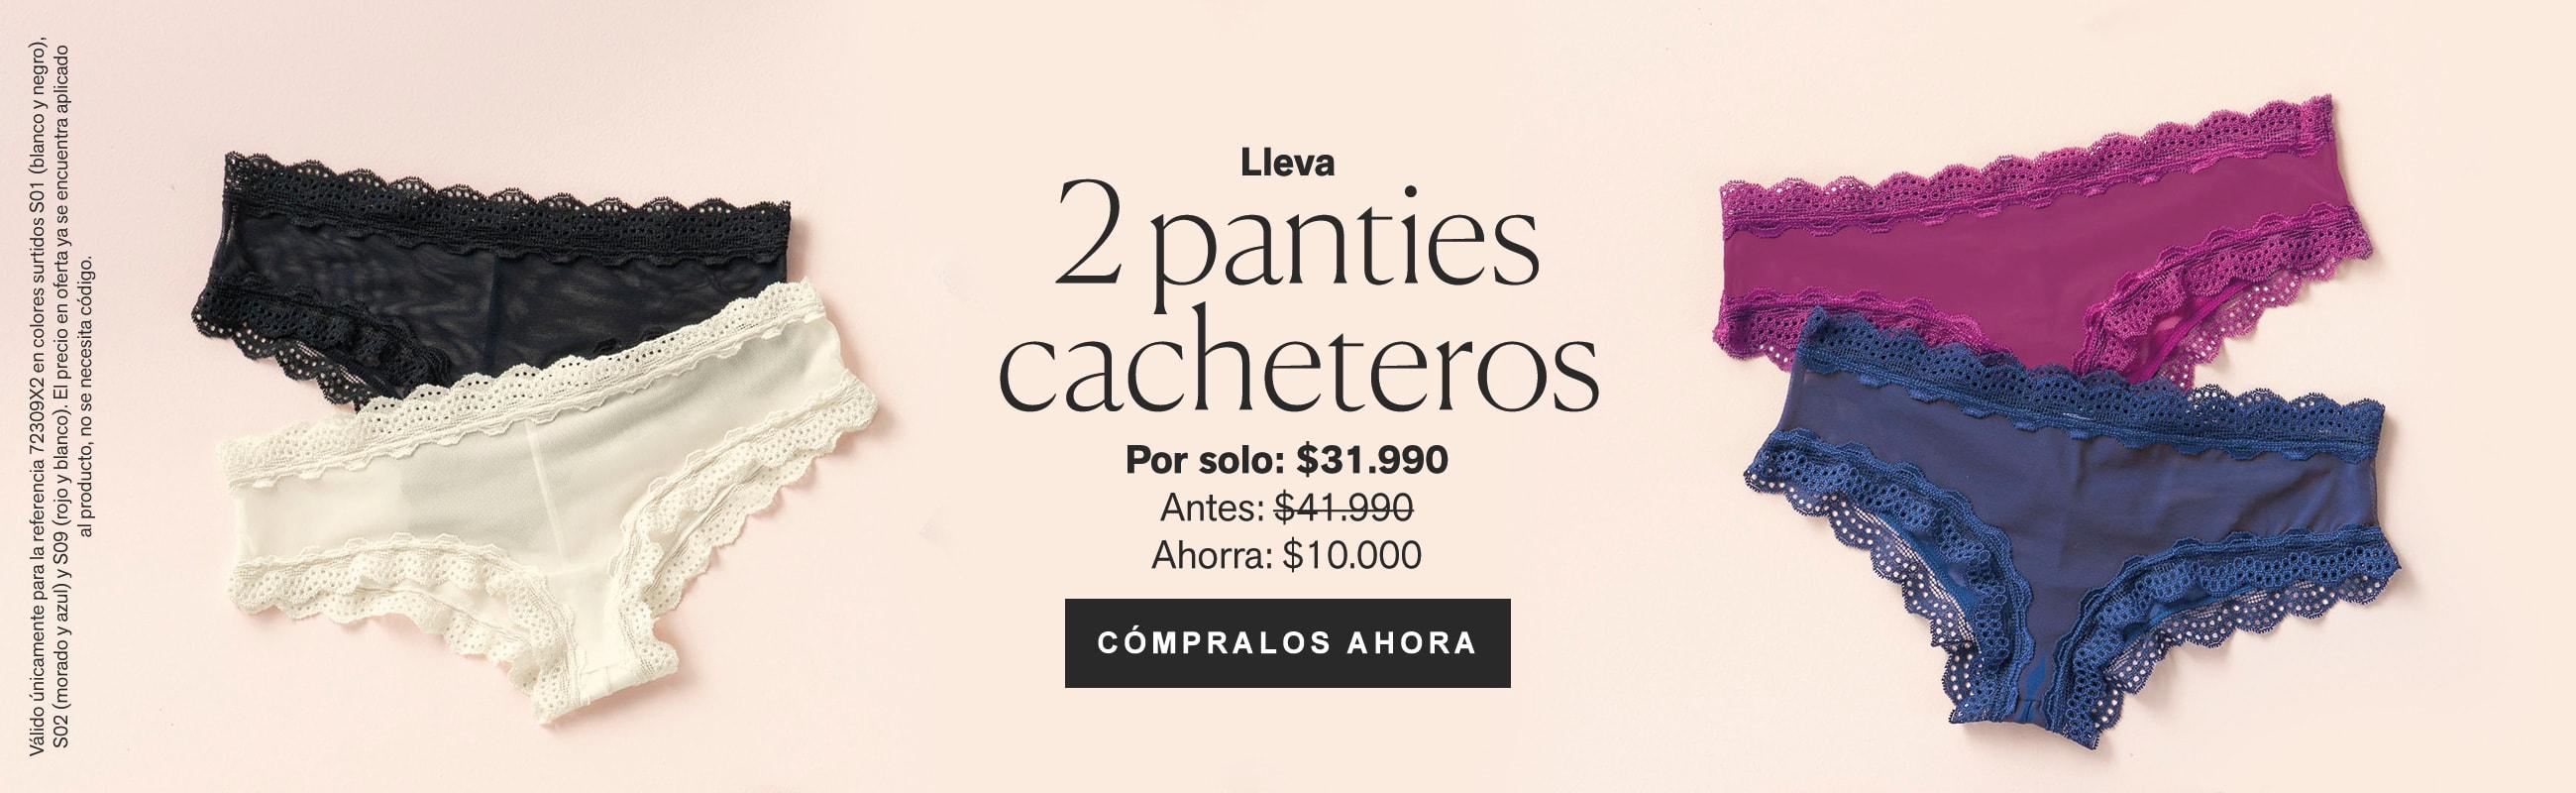 Panties Leonisa